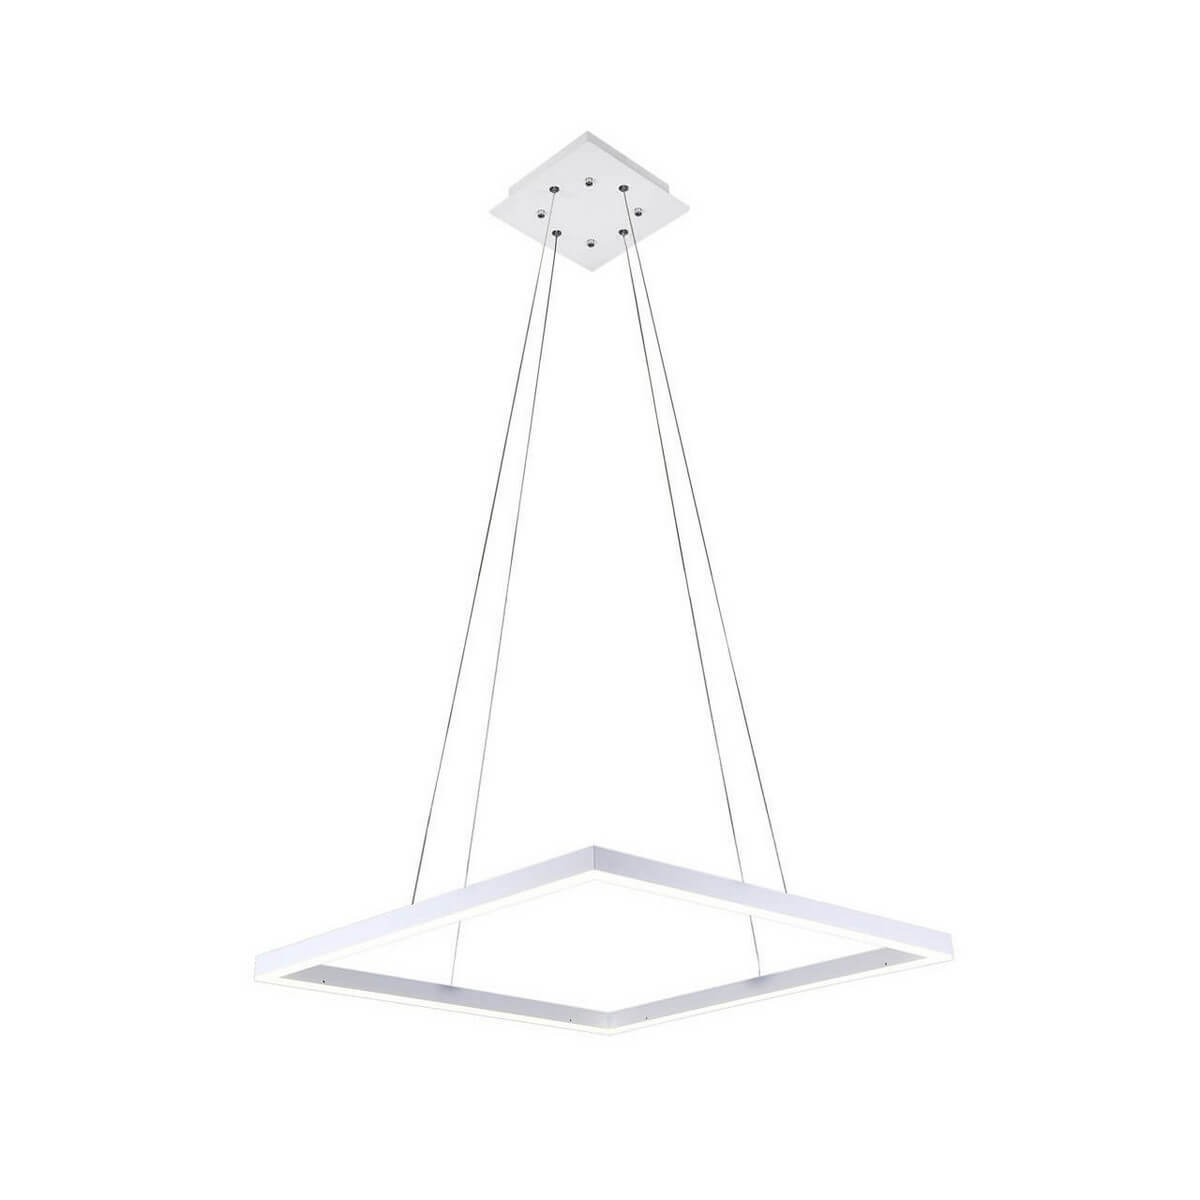 Светильник Kink Light 08225,01(4000K) Альтис kink light настенный светильник kink light ансер 08151 4000k